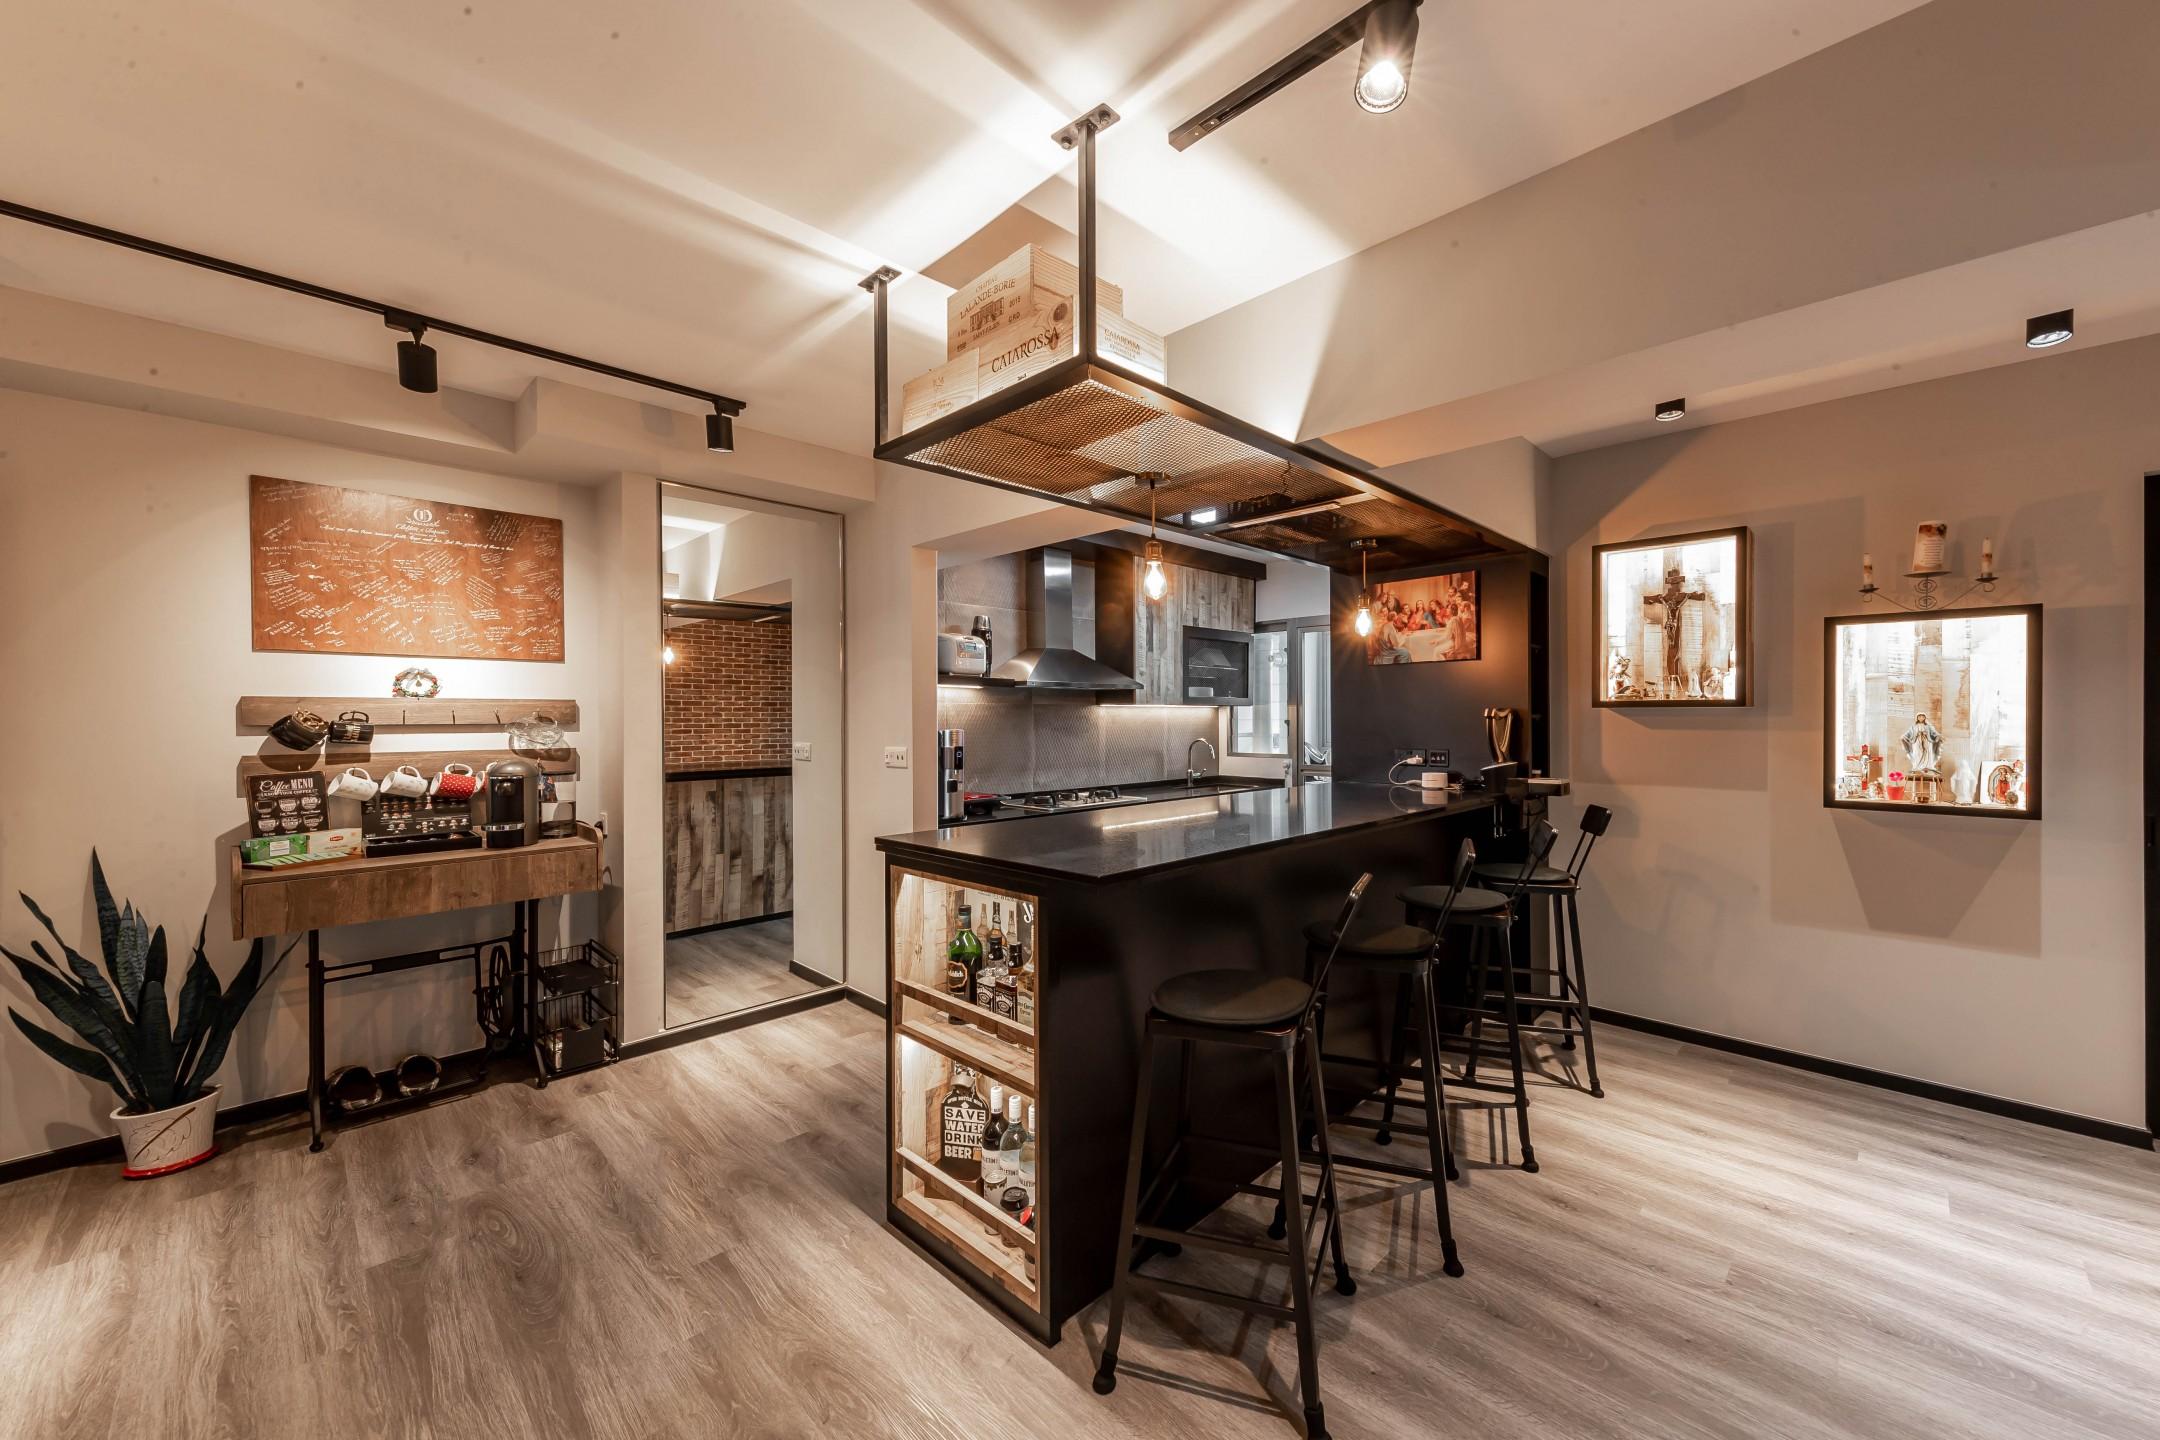 squarerooms renozone northshore industrial home hdb renovation style interior design kitchen island bar religious artwork hidden door